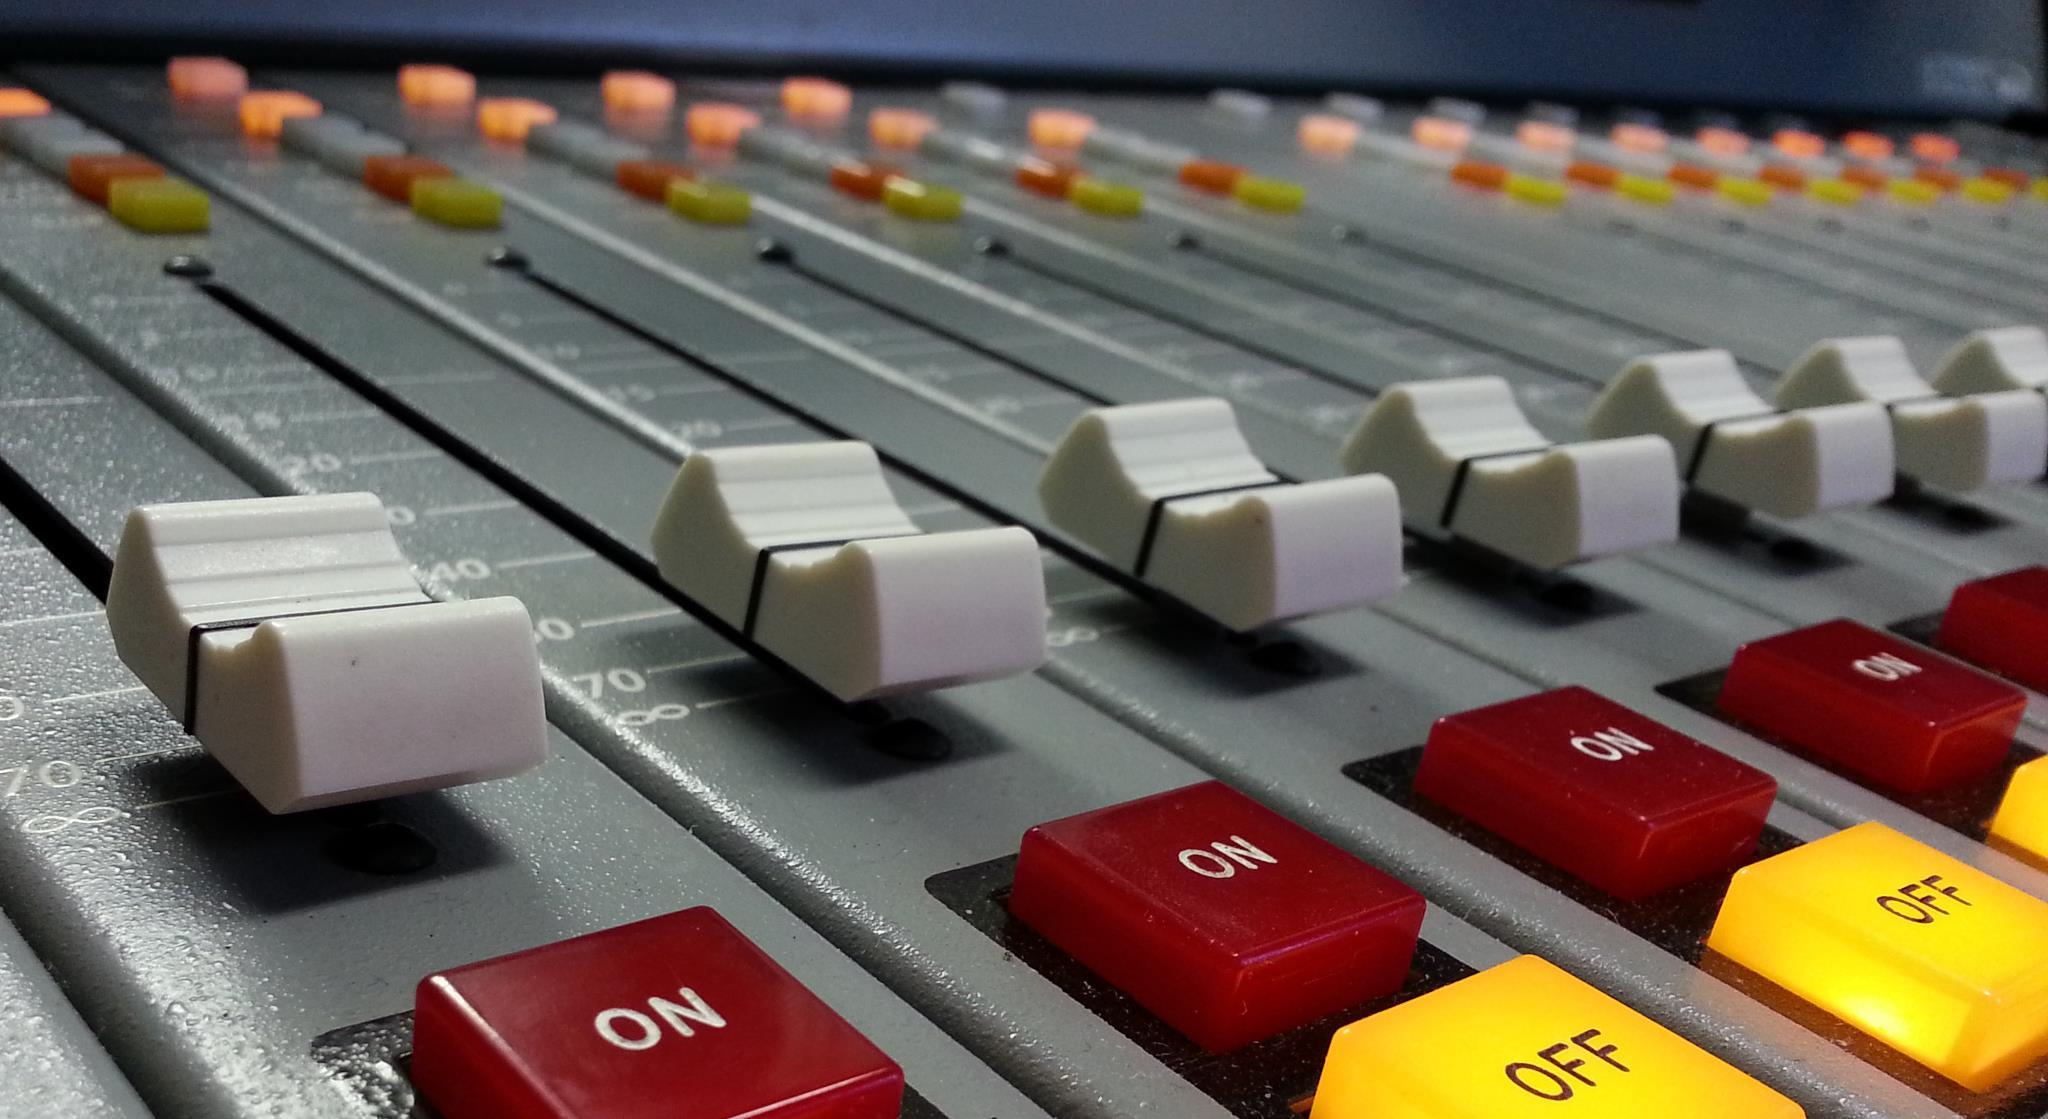 Radio Station Console Radio Station Licensed to